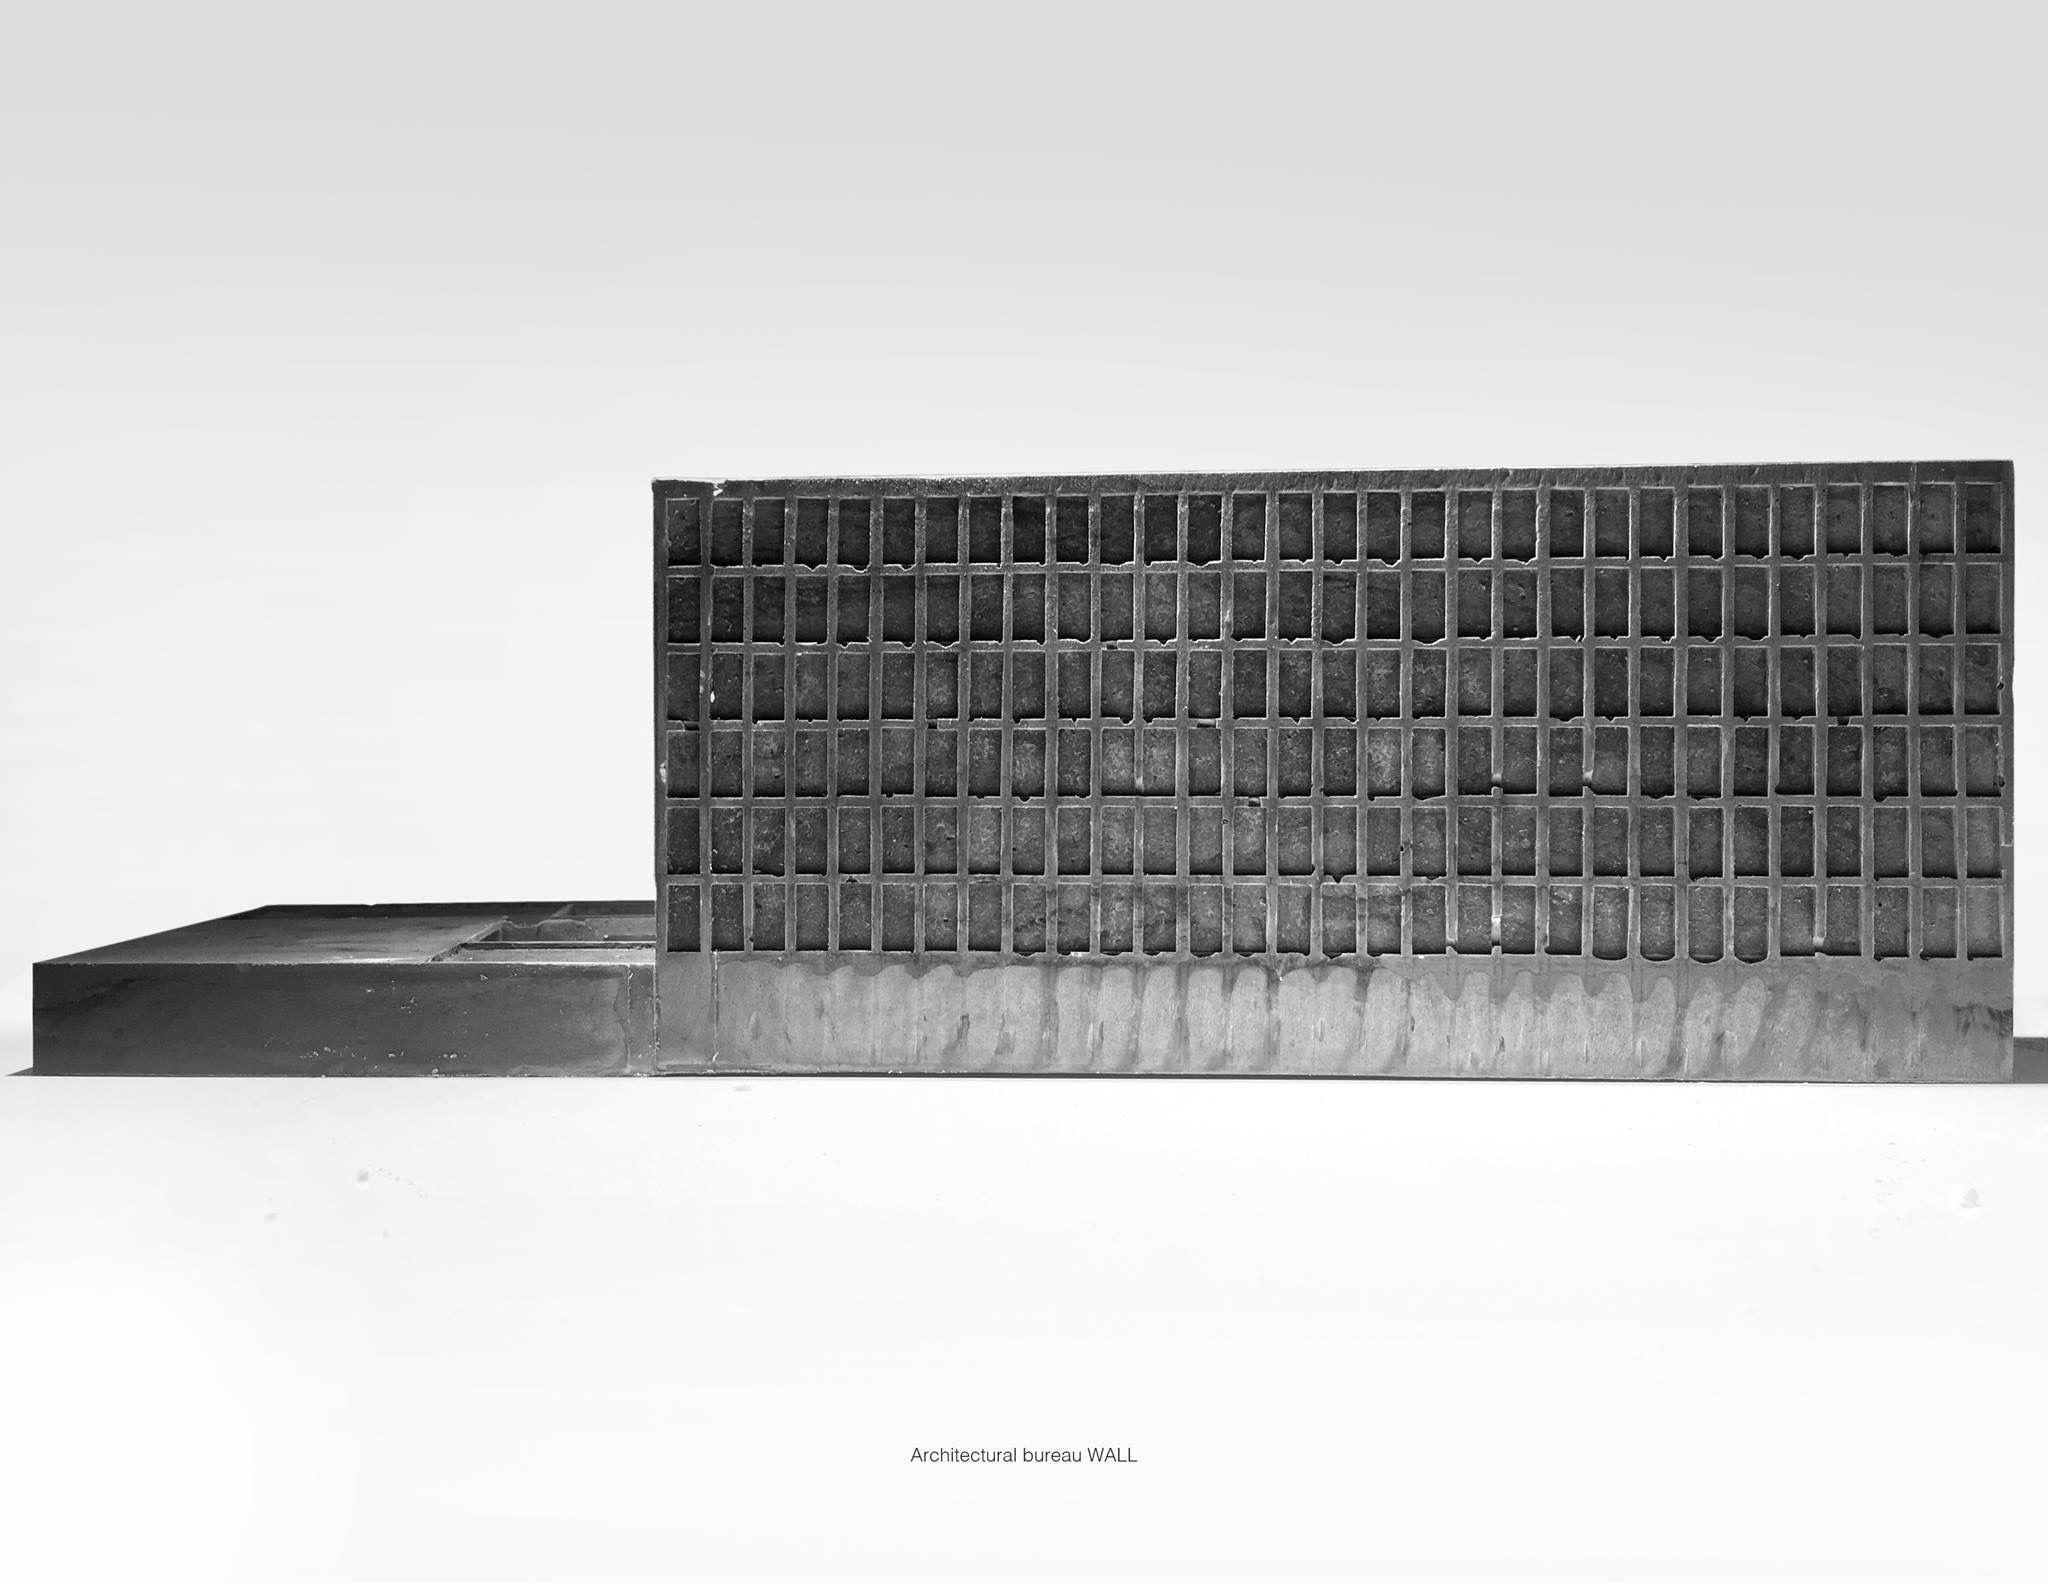 Architecture bureau wall apartments model gypsum black pigment